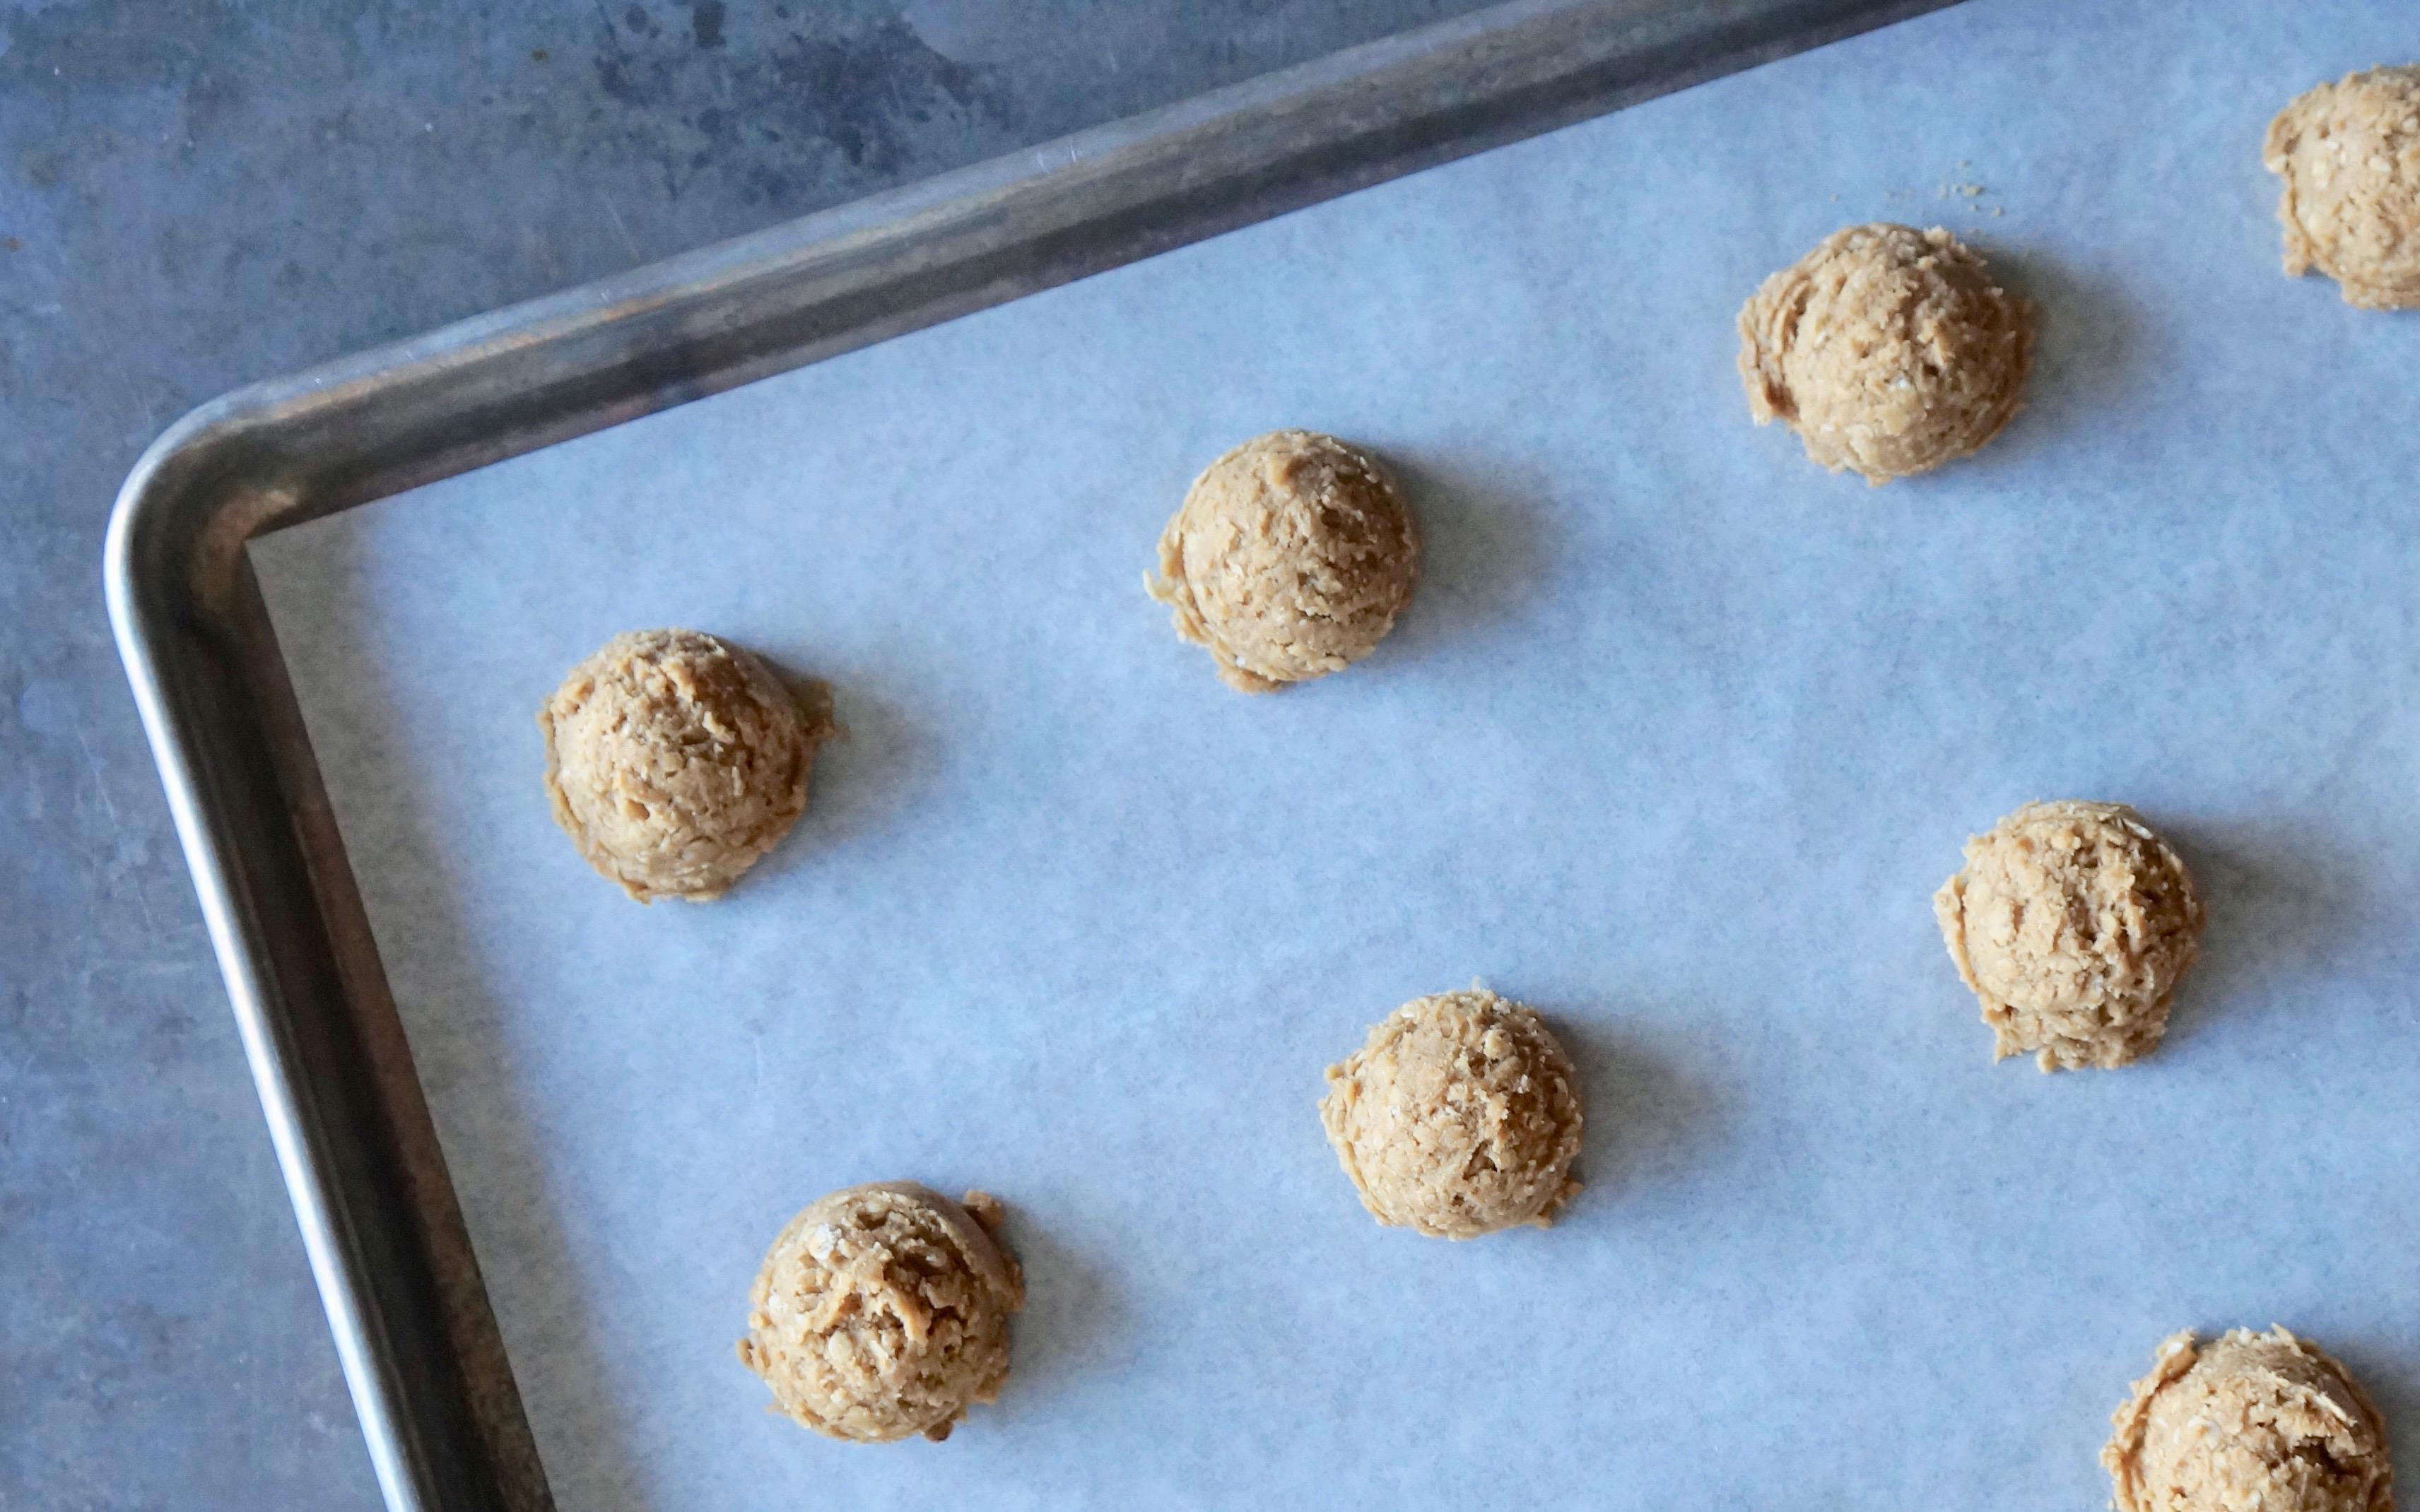 Peanut-Butter-Oatmeal-Cookies-Rebecca-Gordon-Publisher-Buttermilk-Lipstick-Culinary-Entertaining-Techniques-Southern-Hostess-RebeccaGordon-Pastry-Chef-Birmingham-Alabama